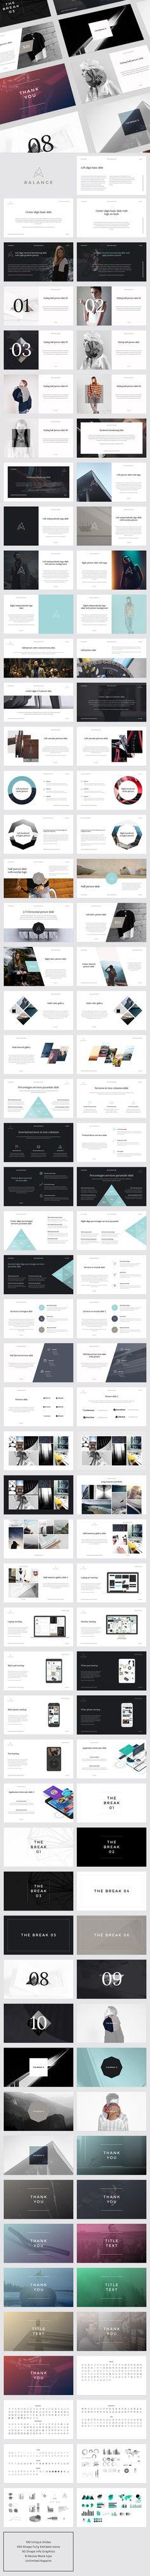 BALANCE PowerPoint Presentation by GoaShape on Creative Market